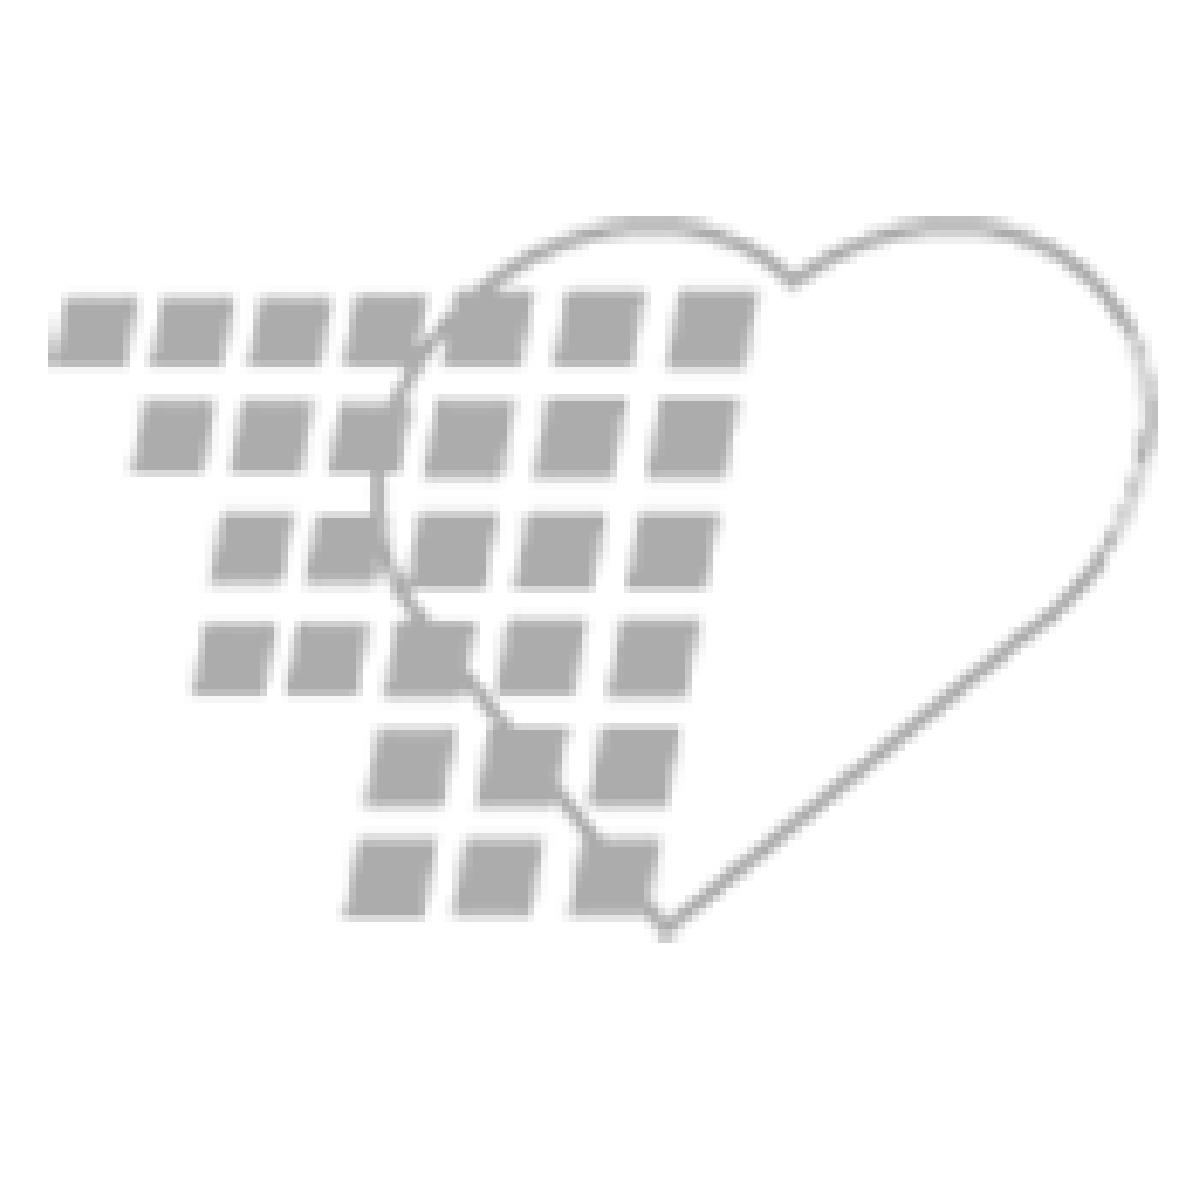 07-71-2073 BD® Asthma Disposable Mouth Piece -Pediatric